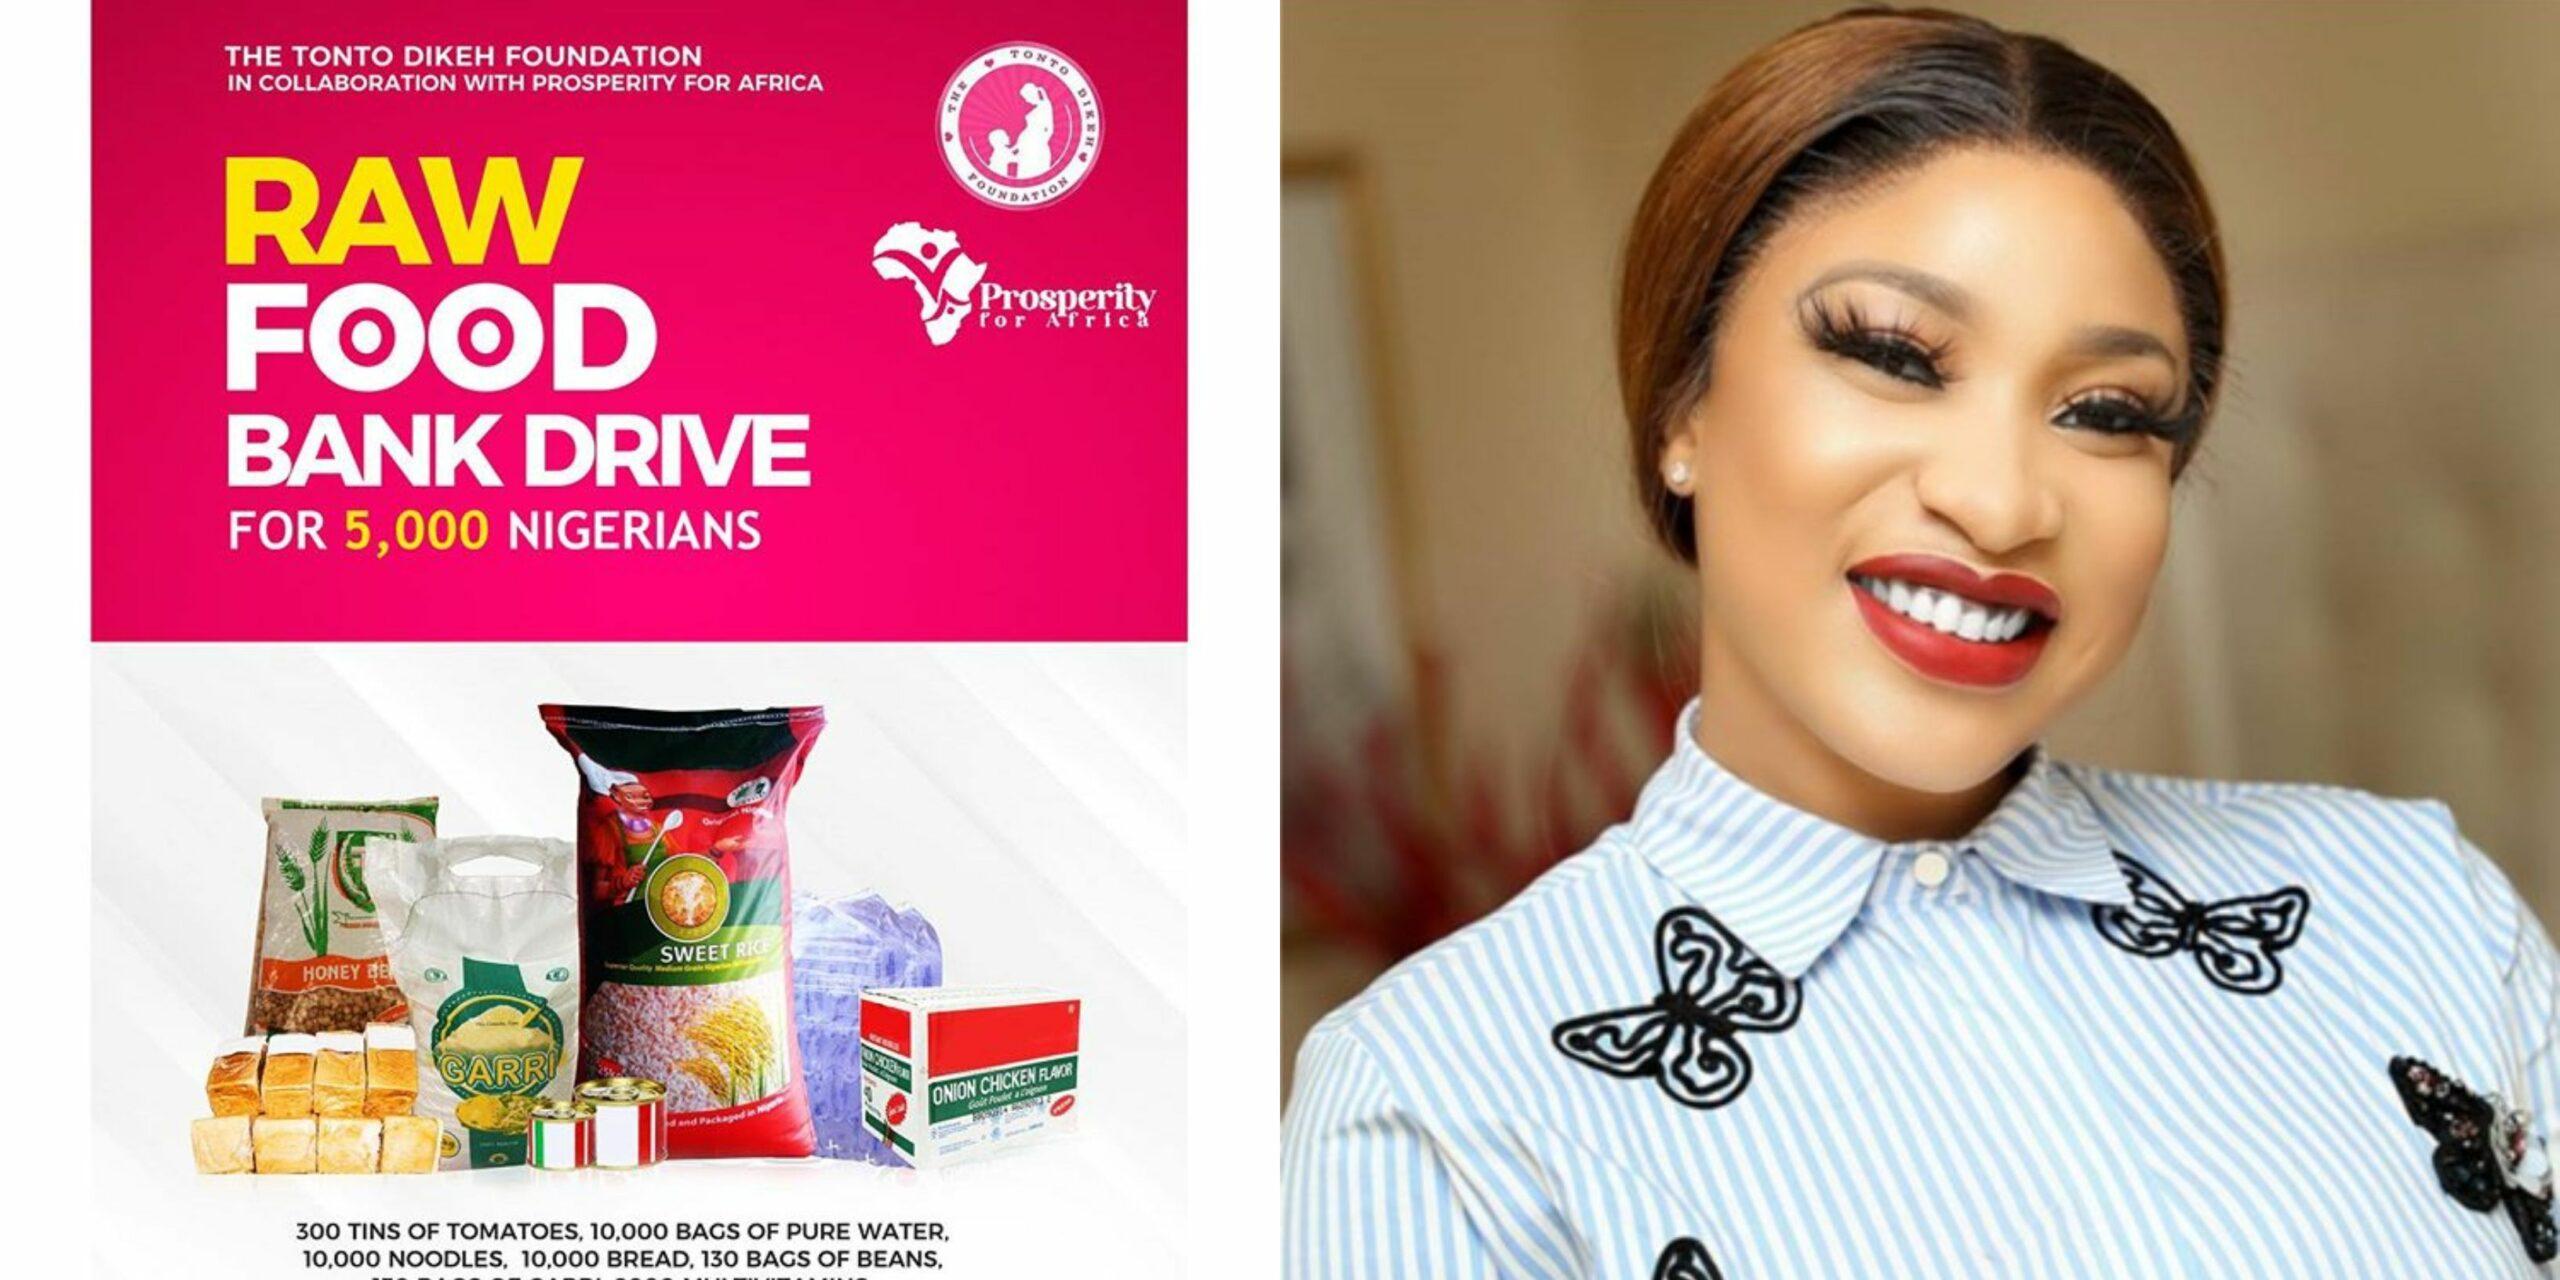 Tonto Dikeh set to donate foodstuffs & drinks to 5,000 Nigerian households (Photos)